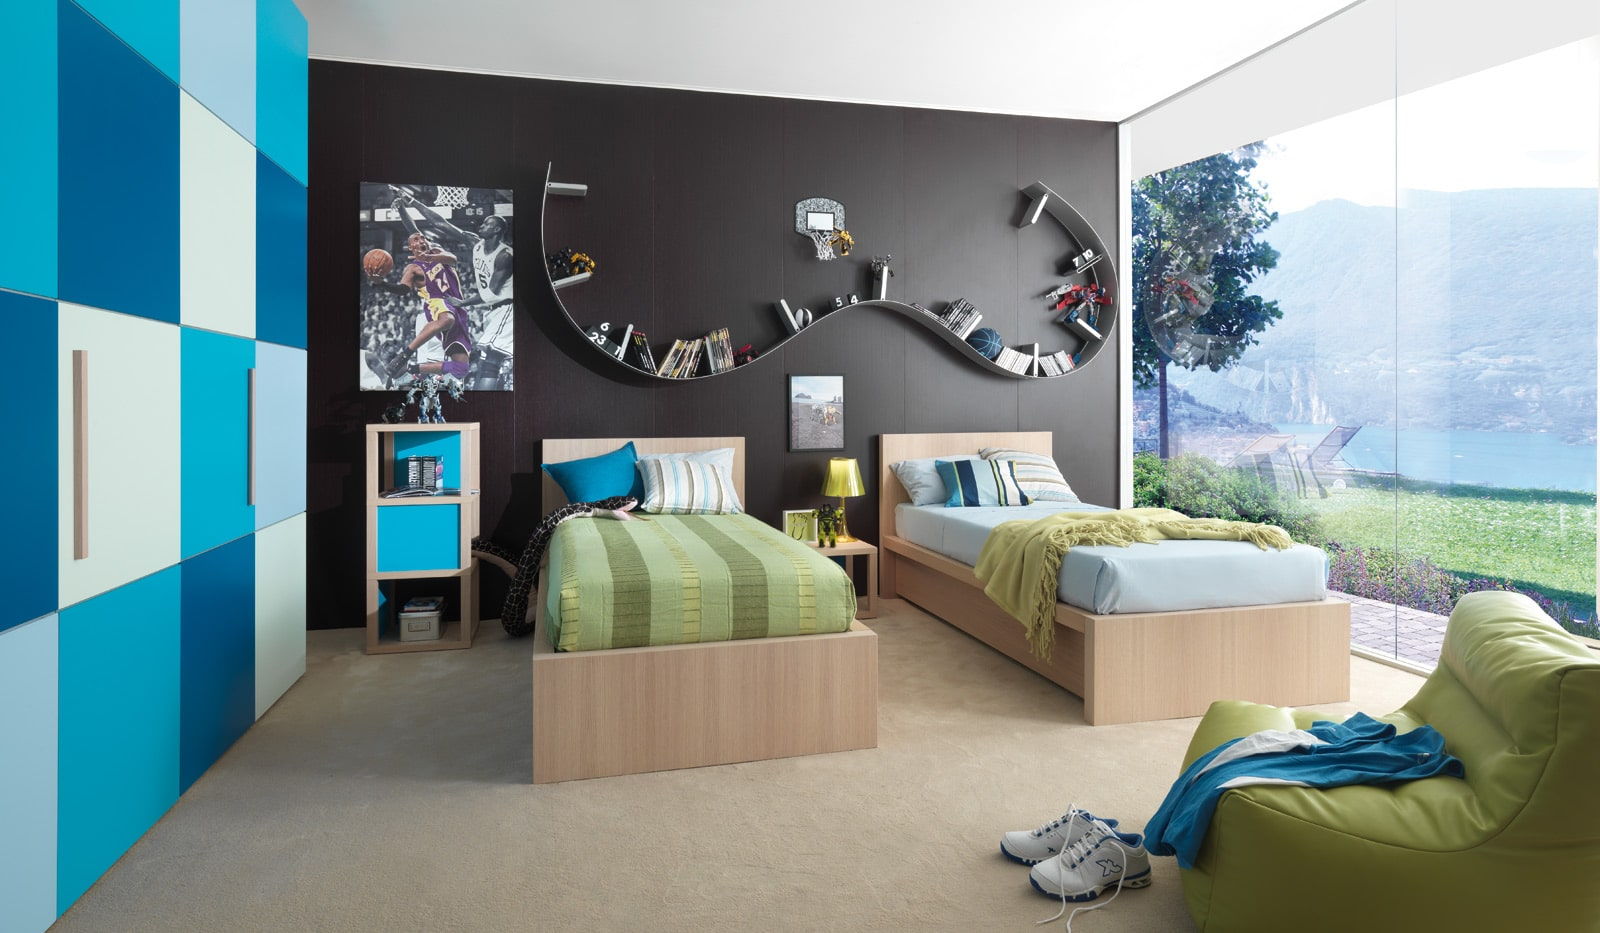 Hochwertige kinderm bel und jugendm bel mit modernem design - Jugendzimmer farben ...